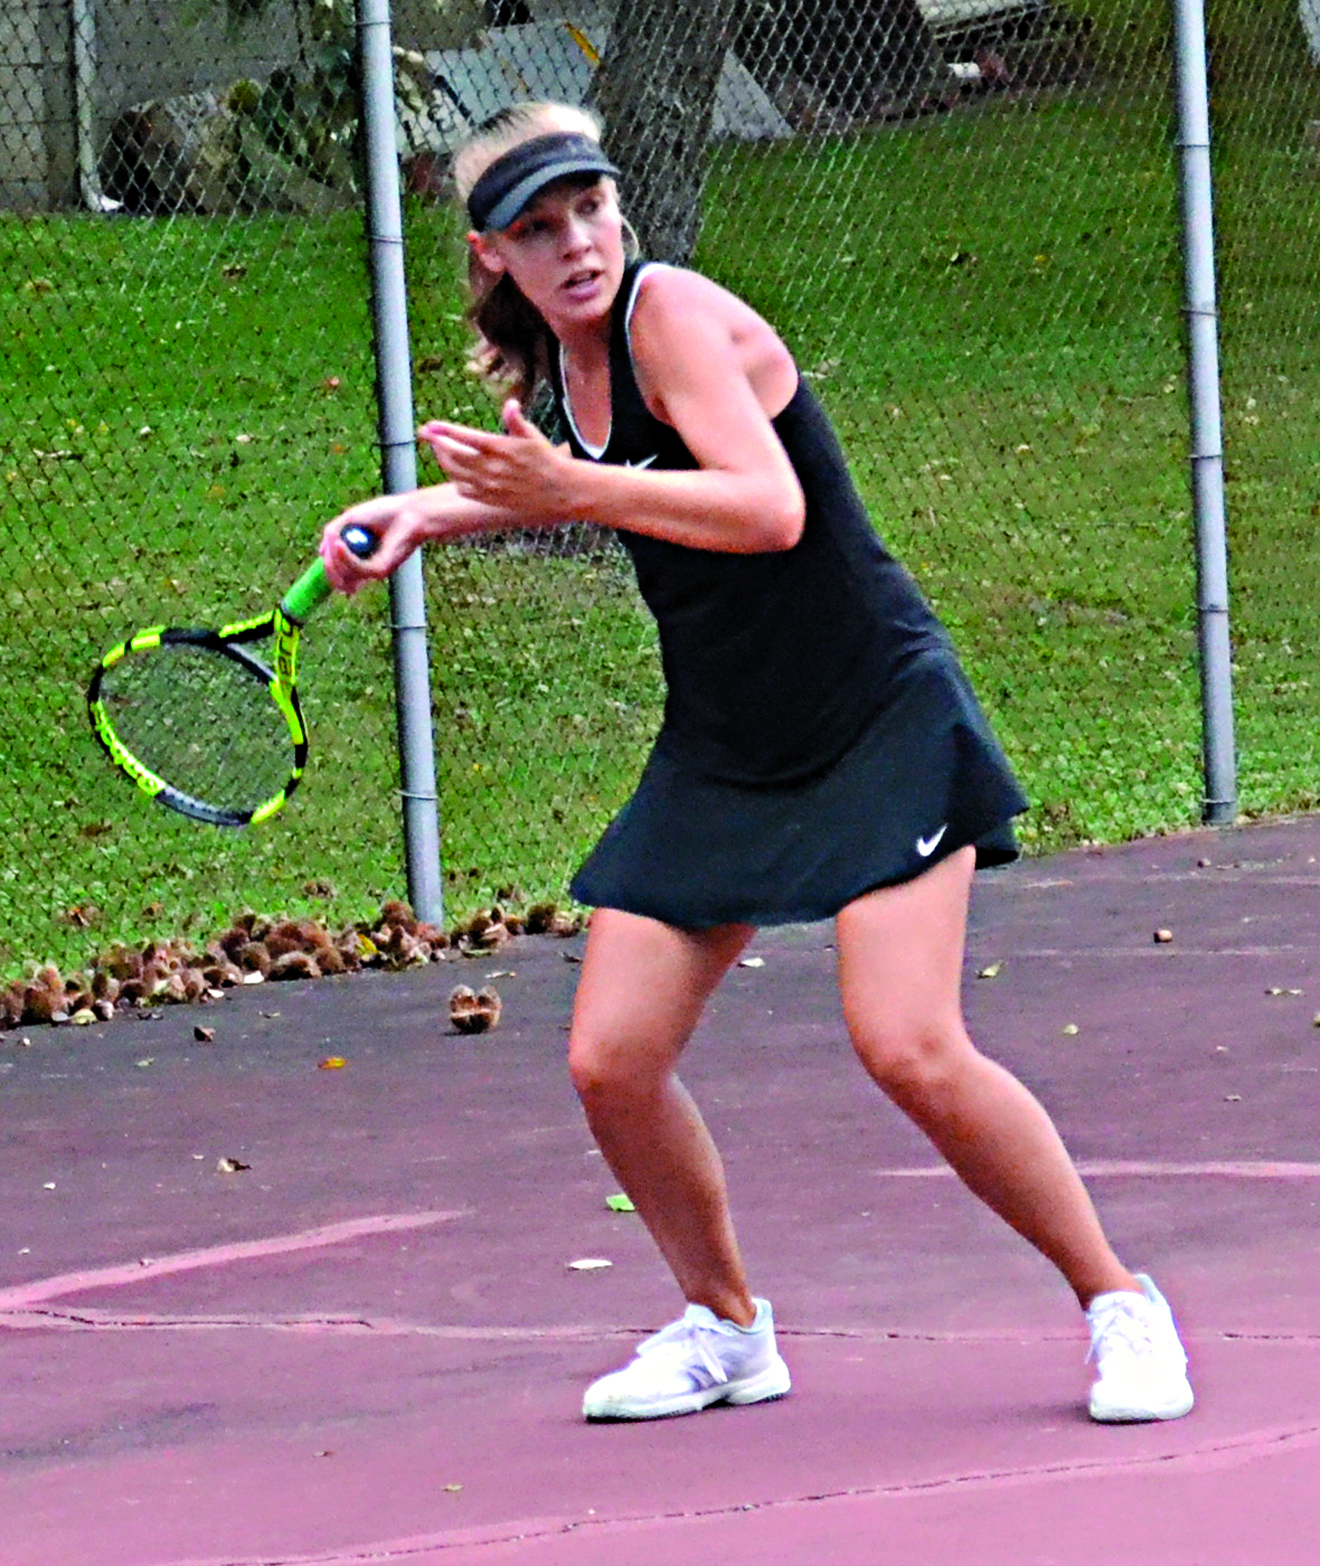 sofa sport tennis sleek modern bed ohio sectionals today news sports jobs